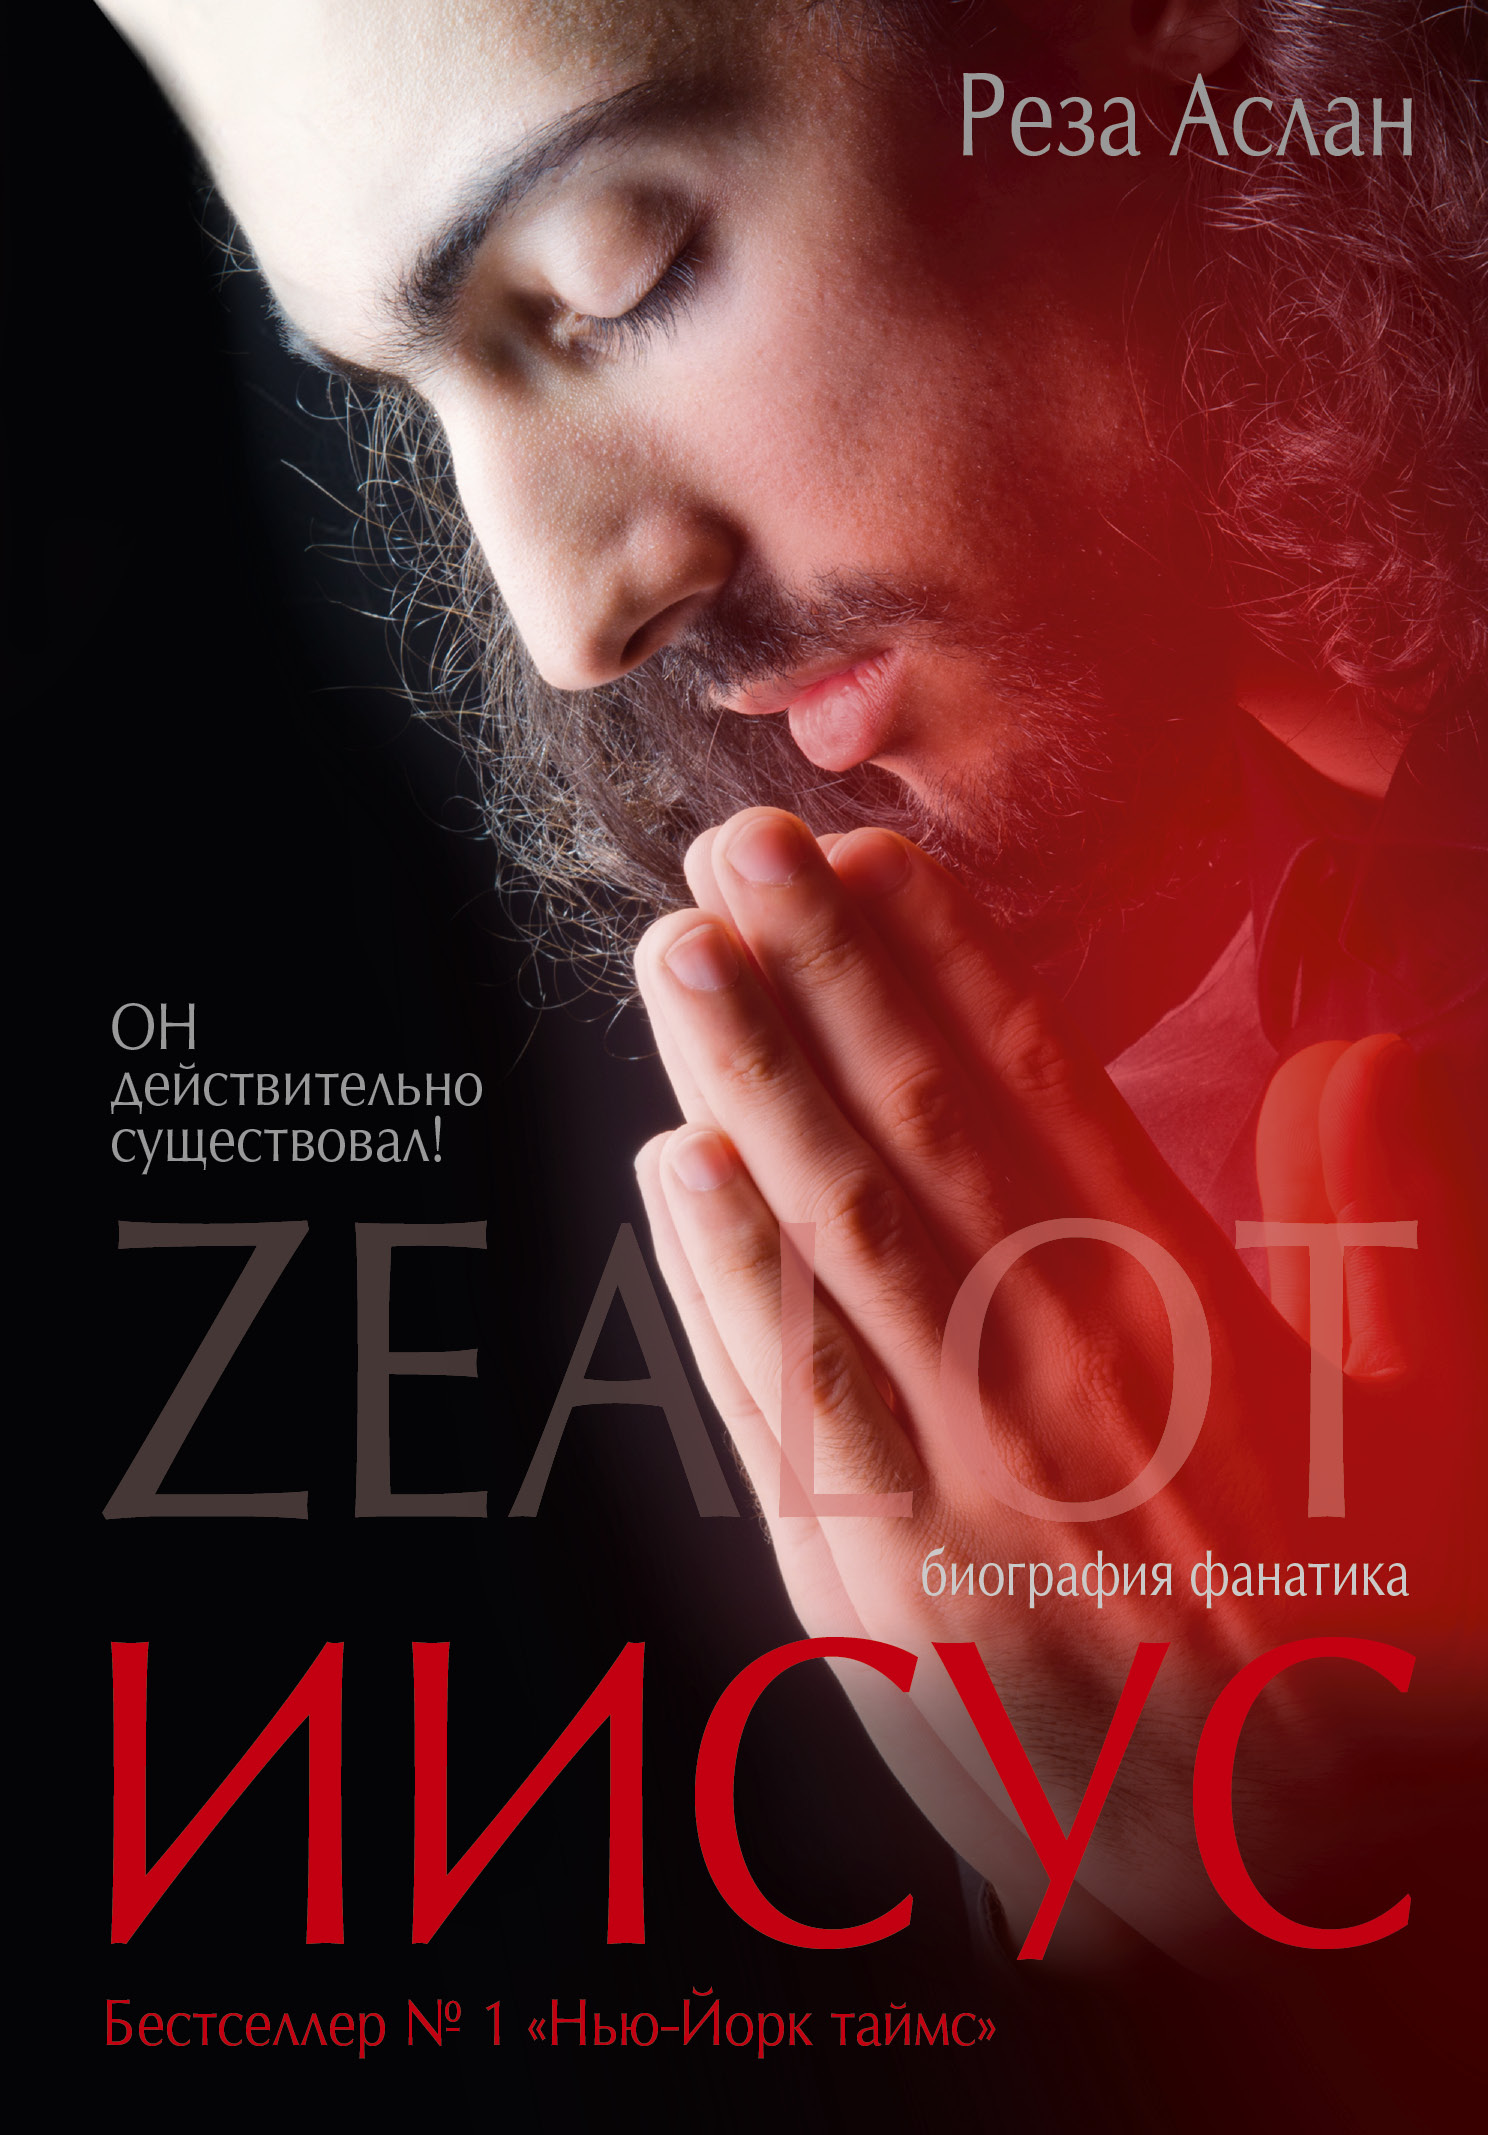 Zealot. Иисус: биография фанатика ( Реза Аслан  )